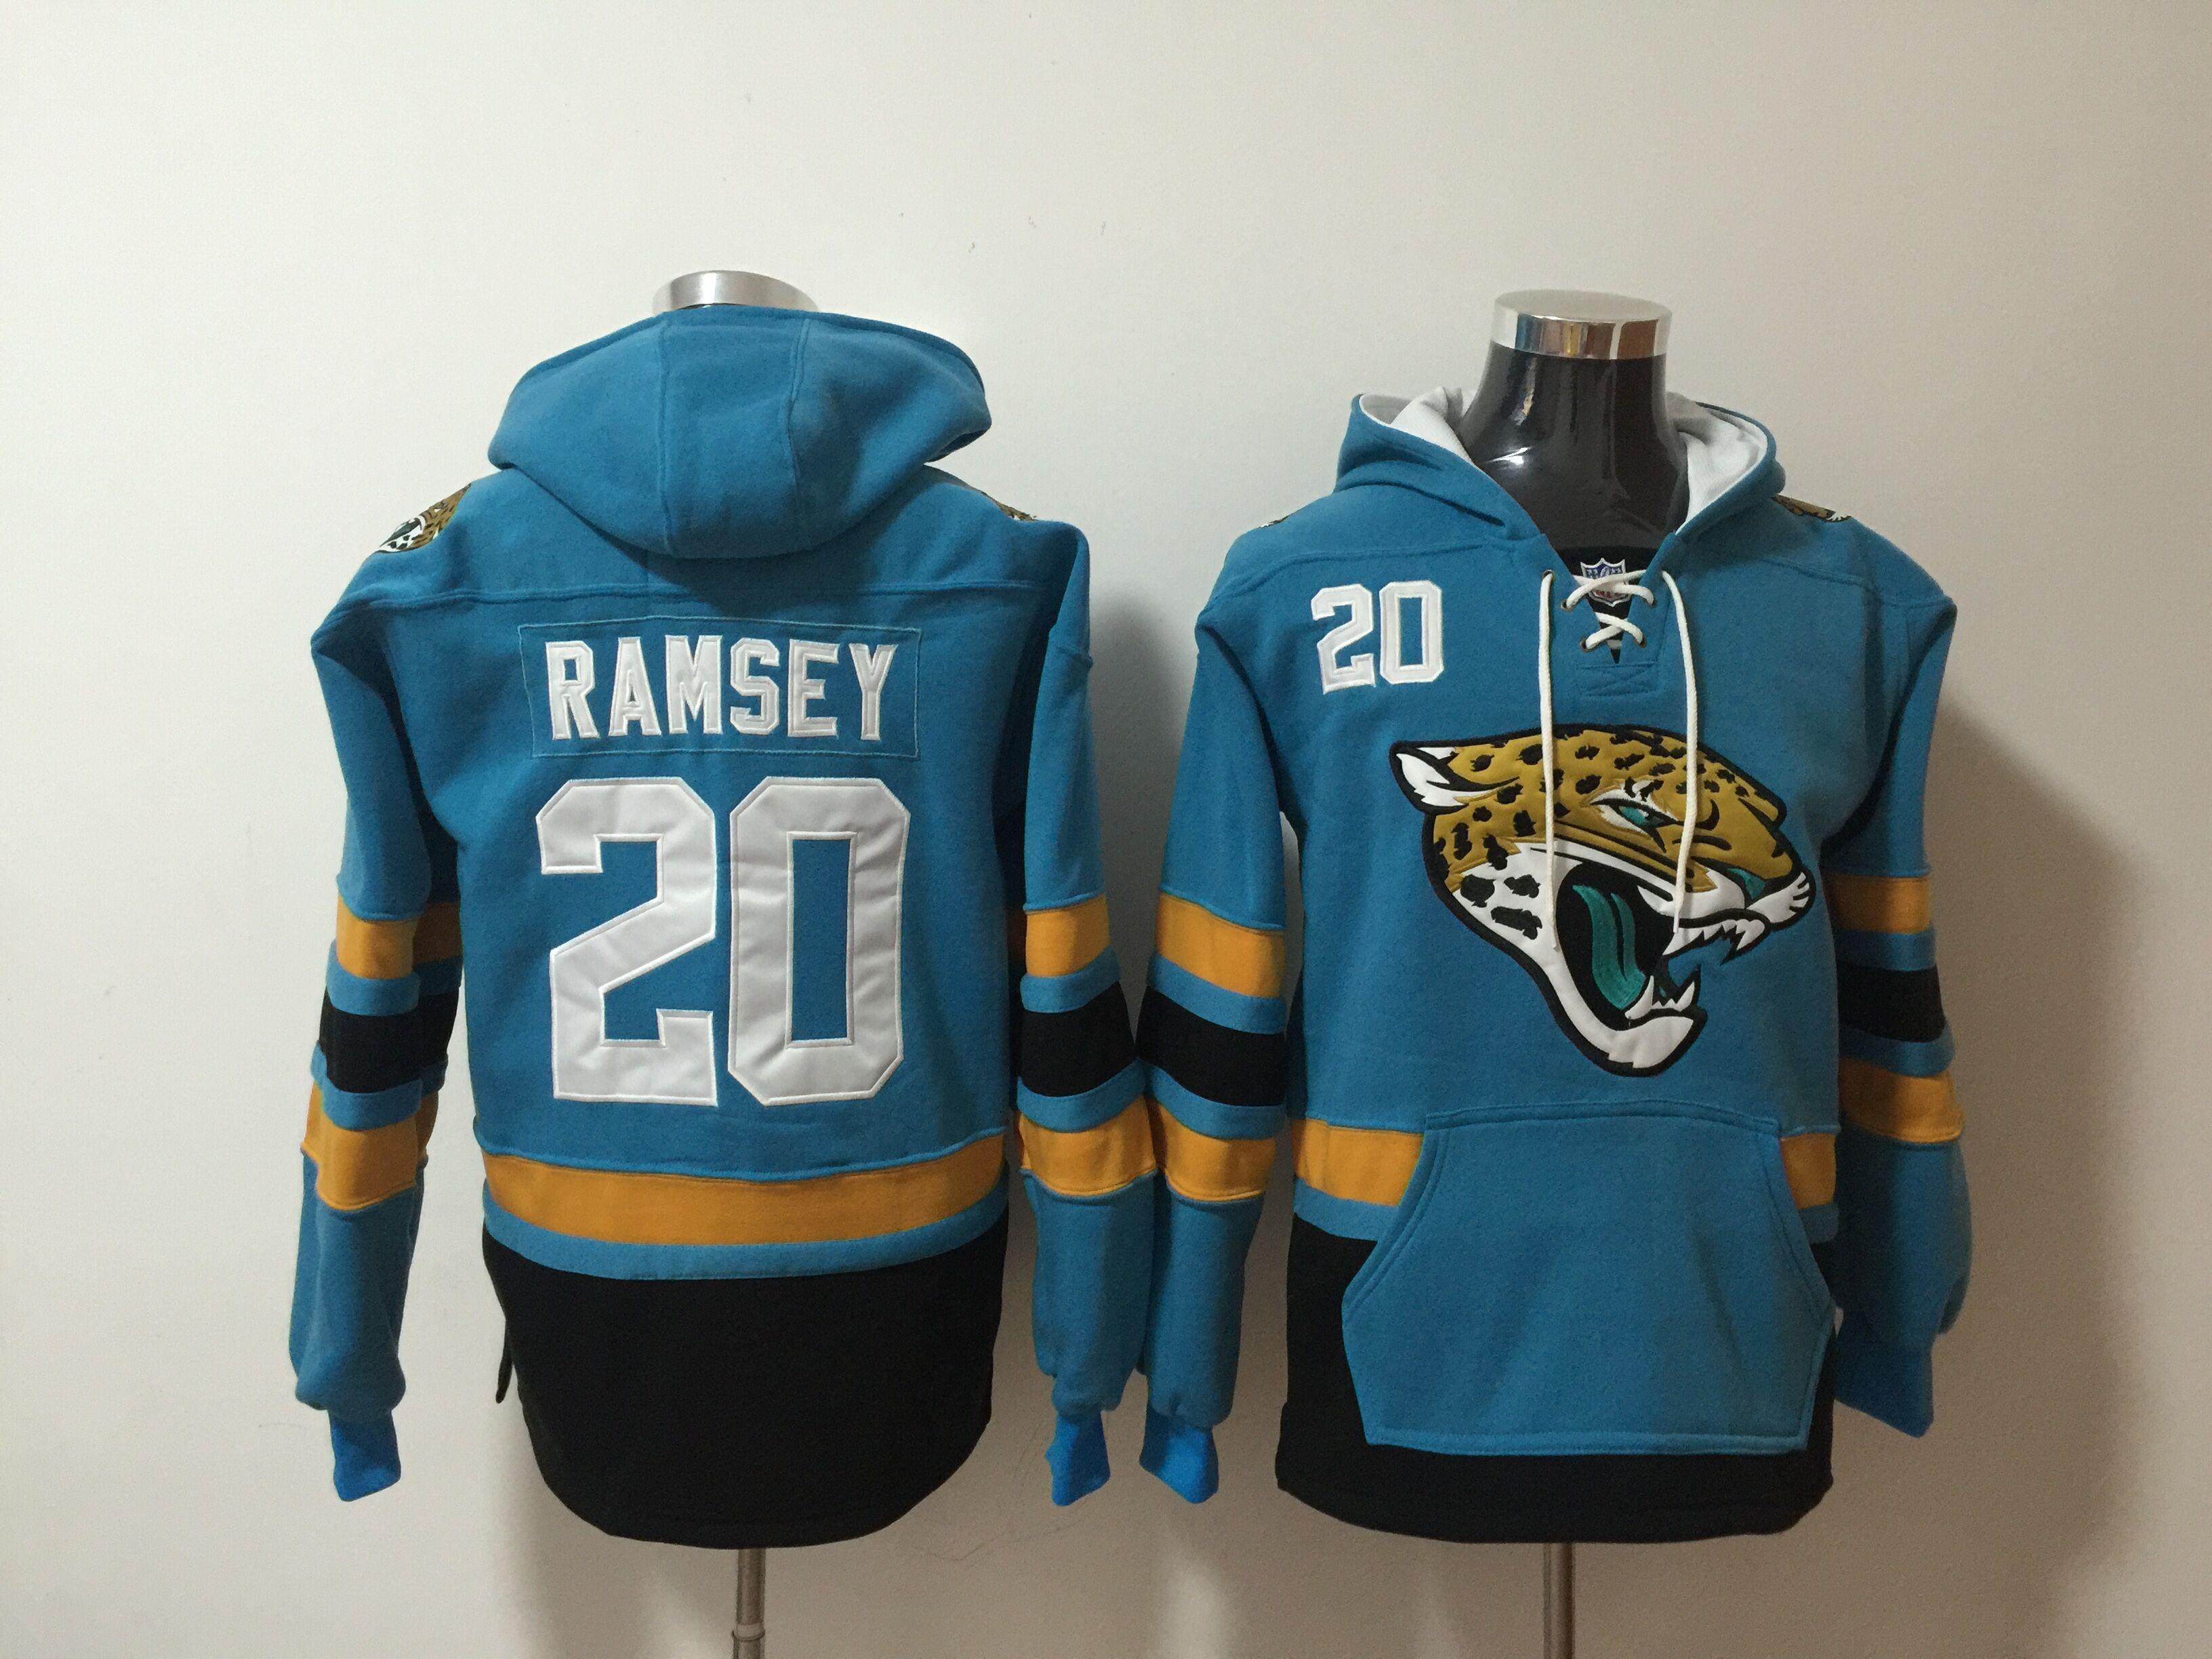 Nike Jaguars 20 Jalen Ramsey Teal All Stitched Hooded Sweatshirt